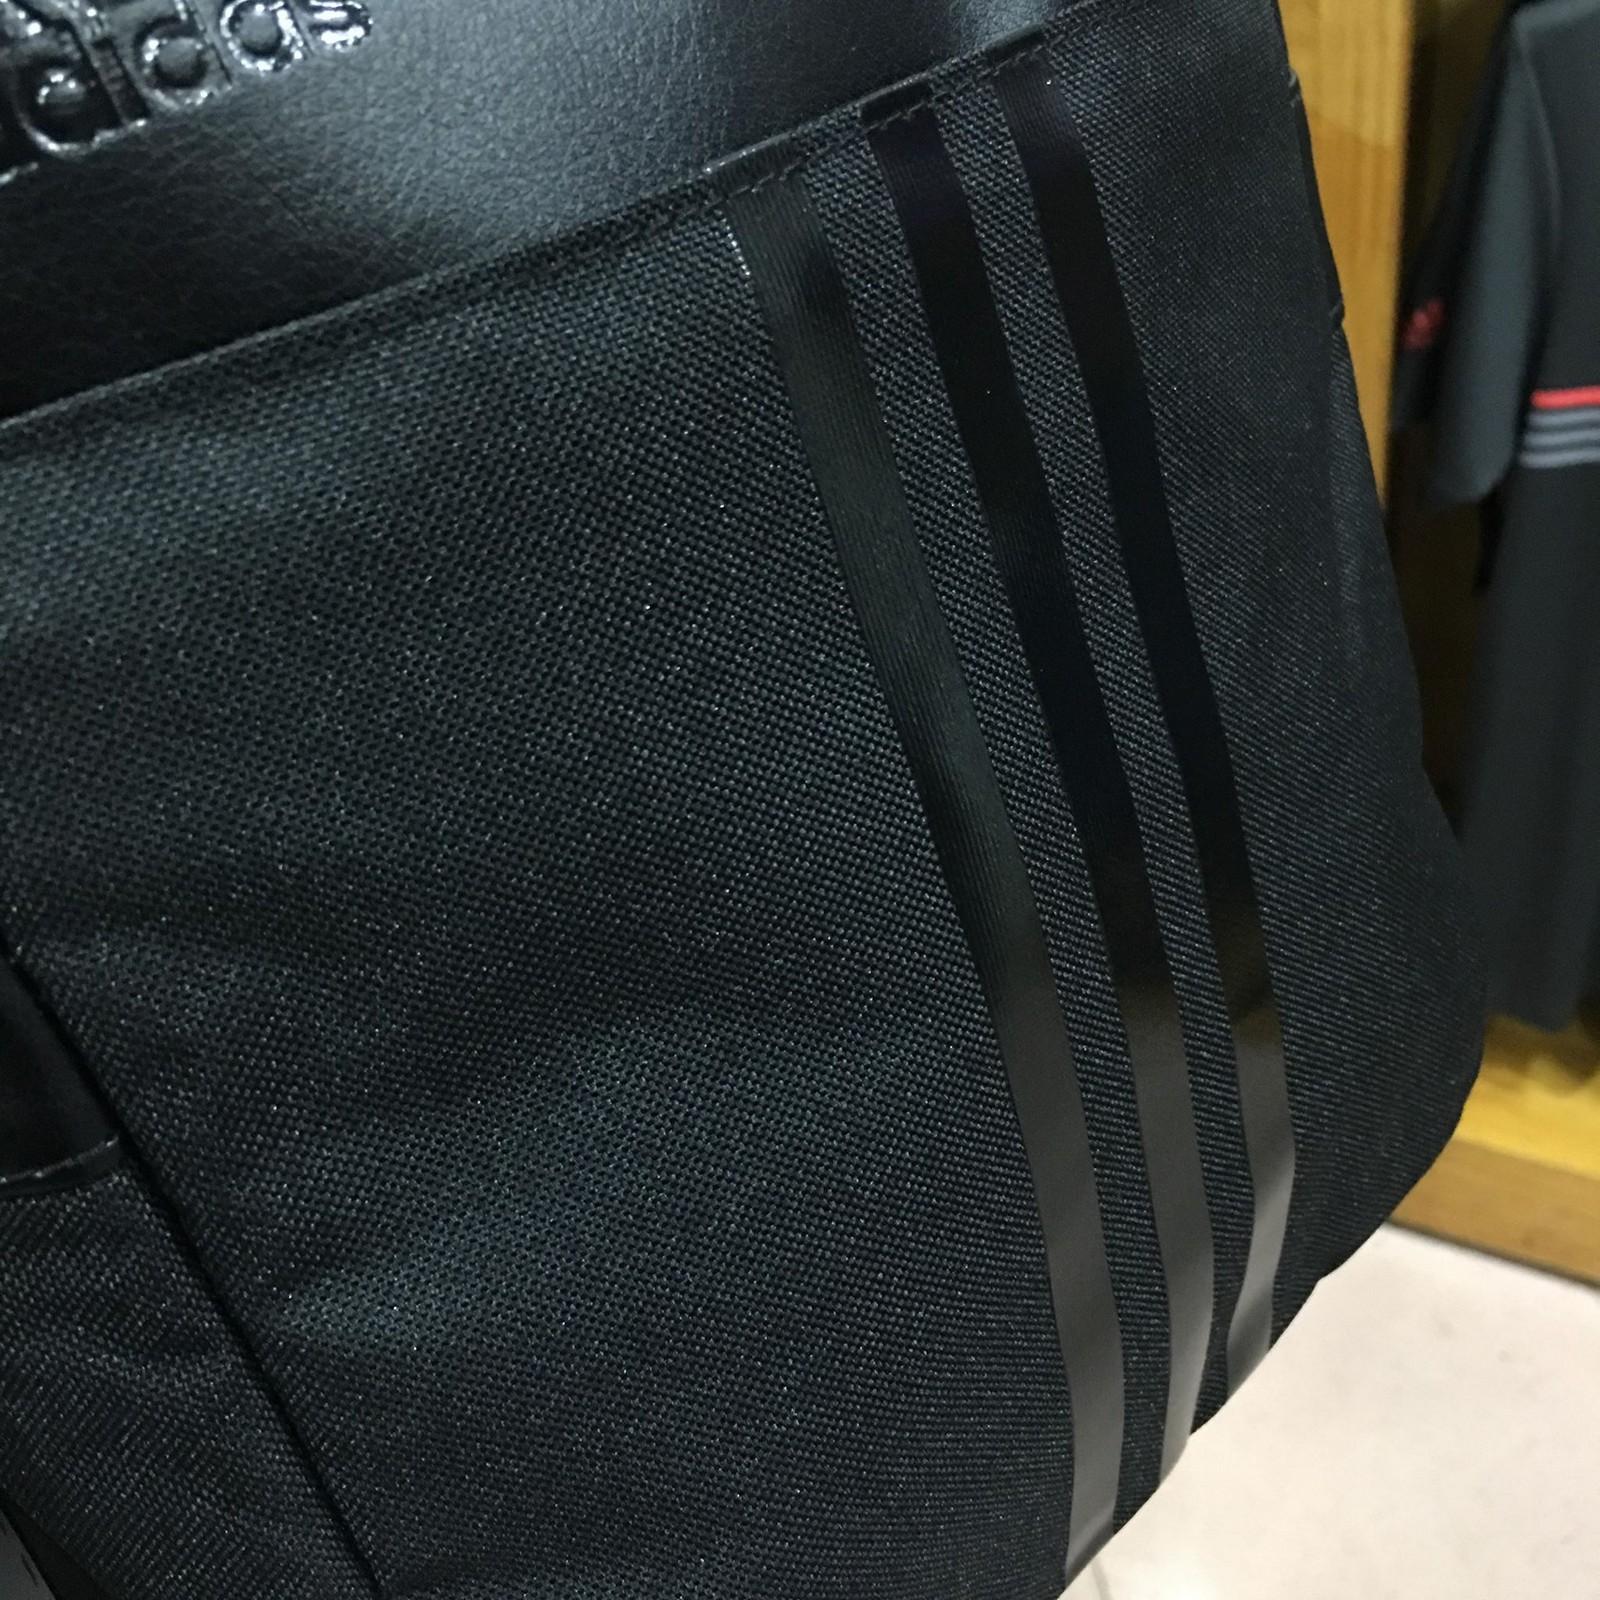 Túi thể thao Adidas Org2 BQ6975